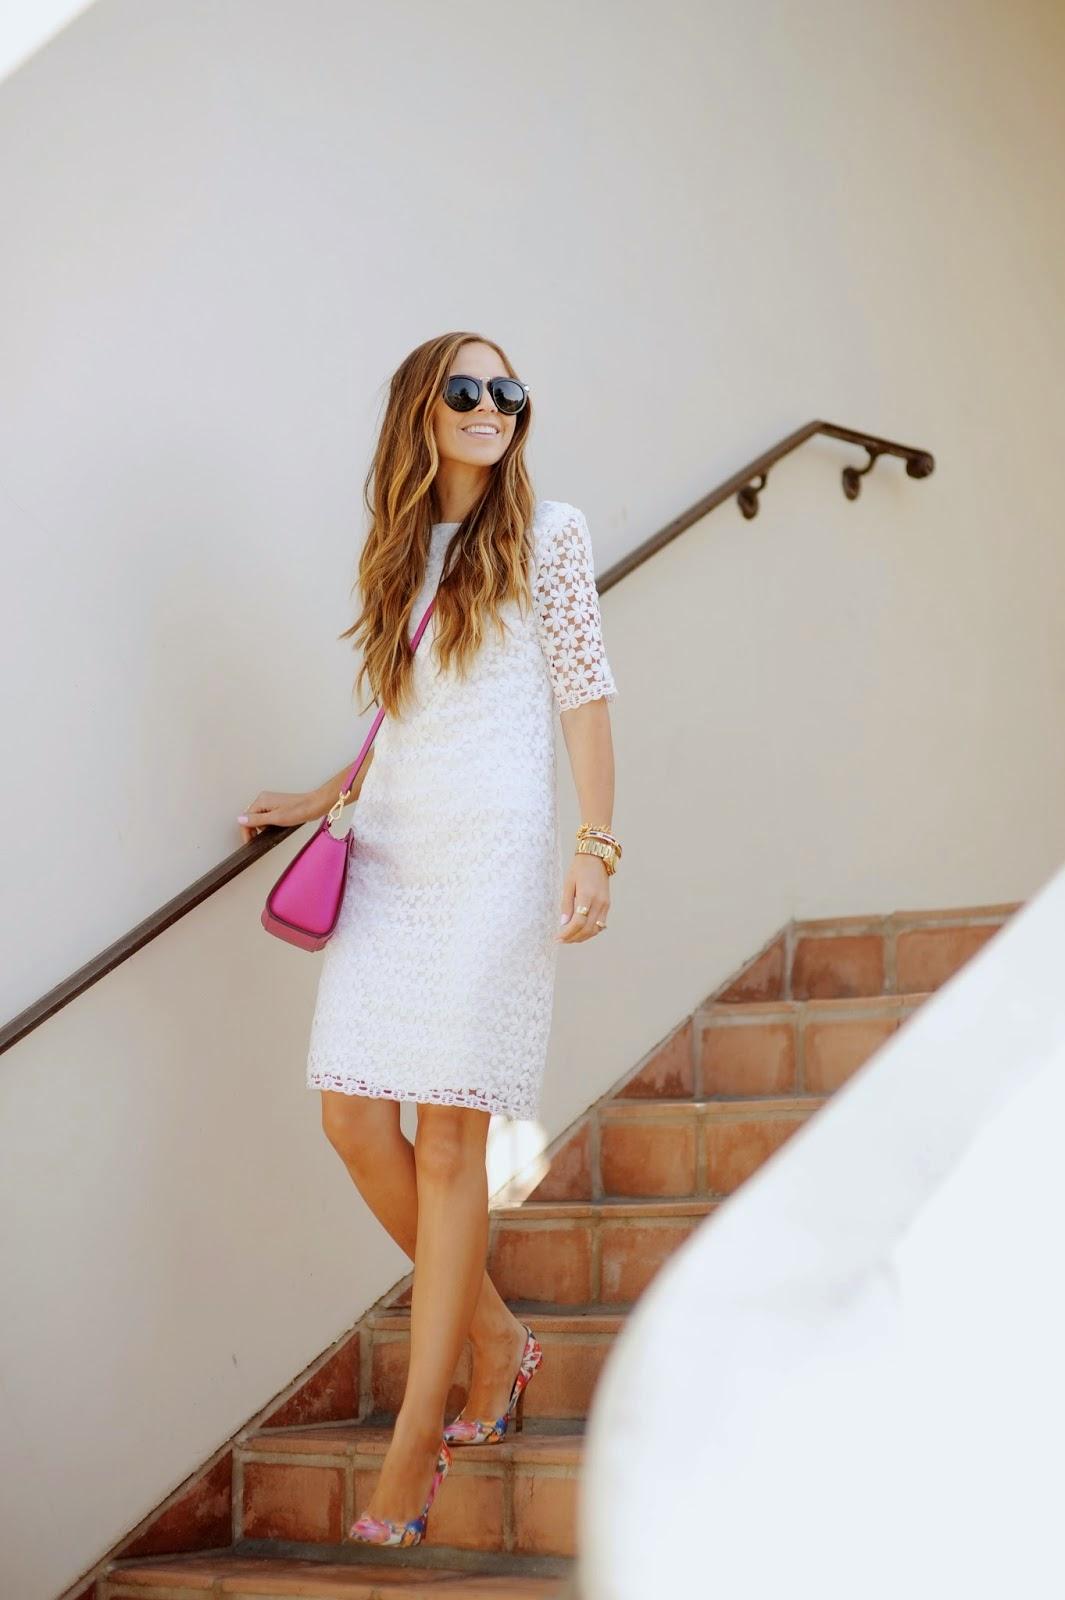 vestido-branco-fashion-curto-moda-feminina-vestido-branco-bolsa-tiracolo-bolsa-rosa-bolsa-feminina-dicas-de-moda-white-dress